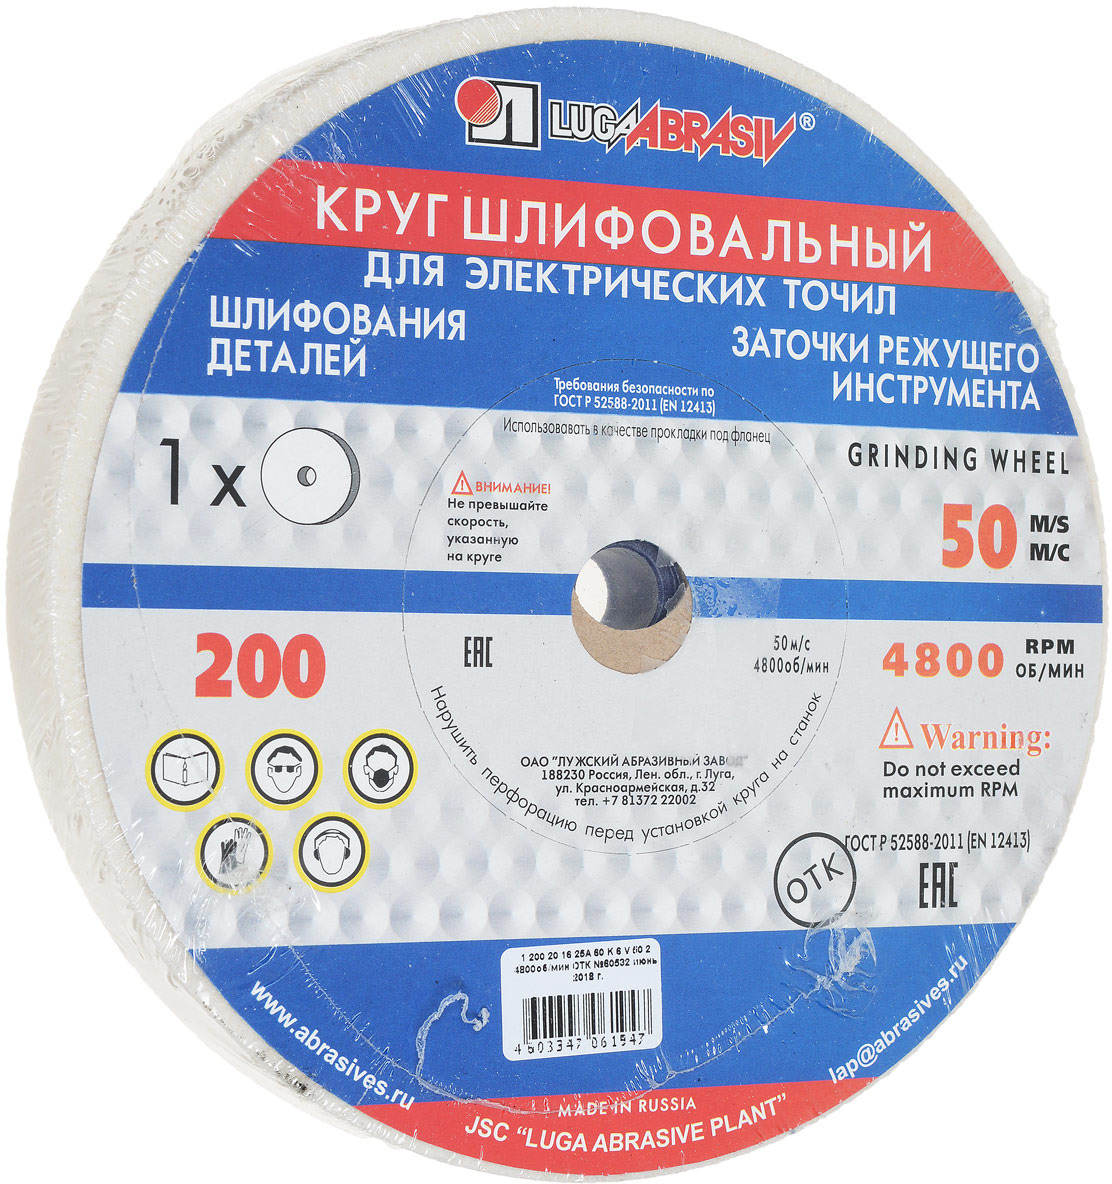 Круг шлифовальный, 25А, F60, (K, L), 200 х 20 х 16 мм